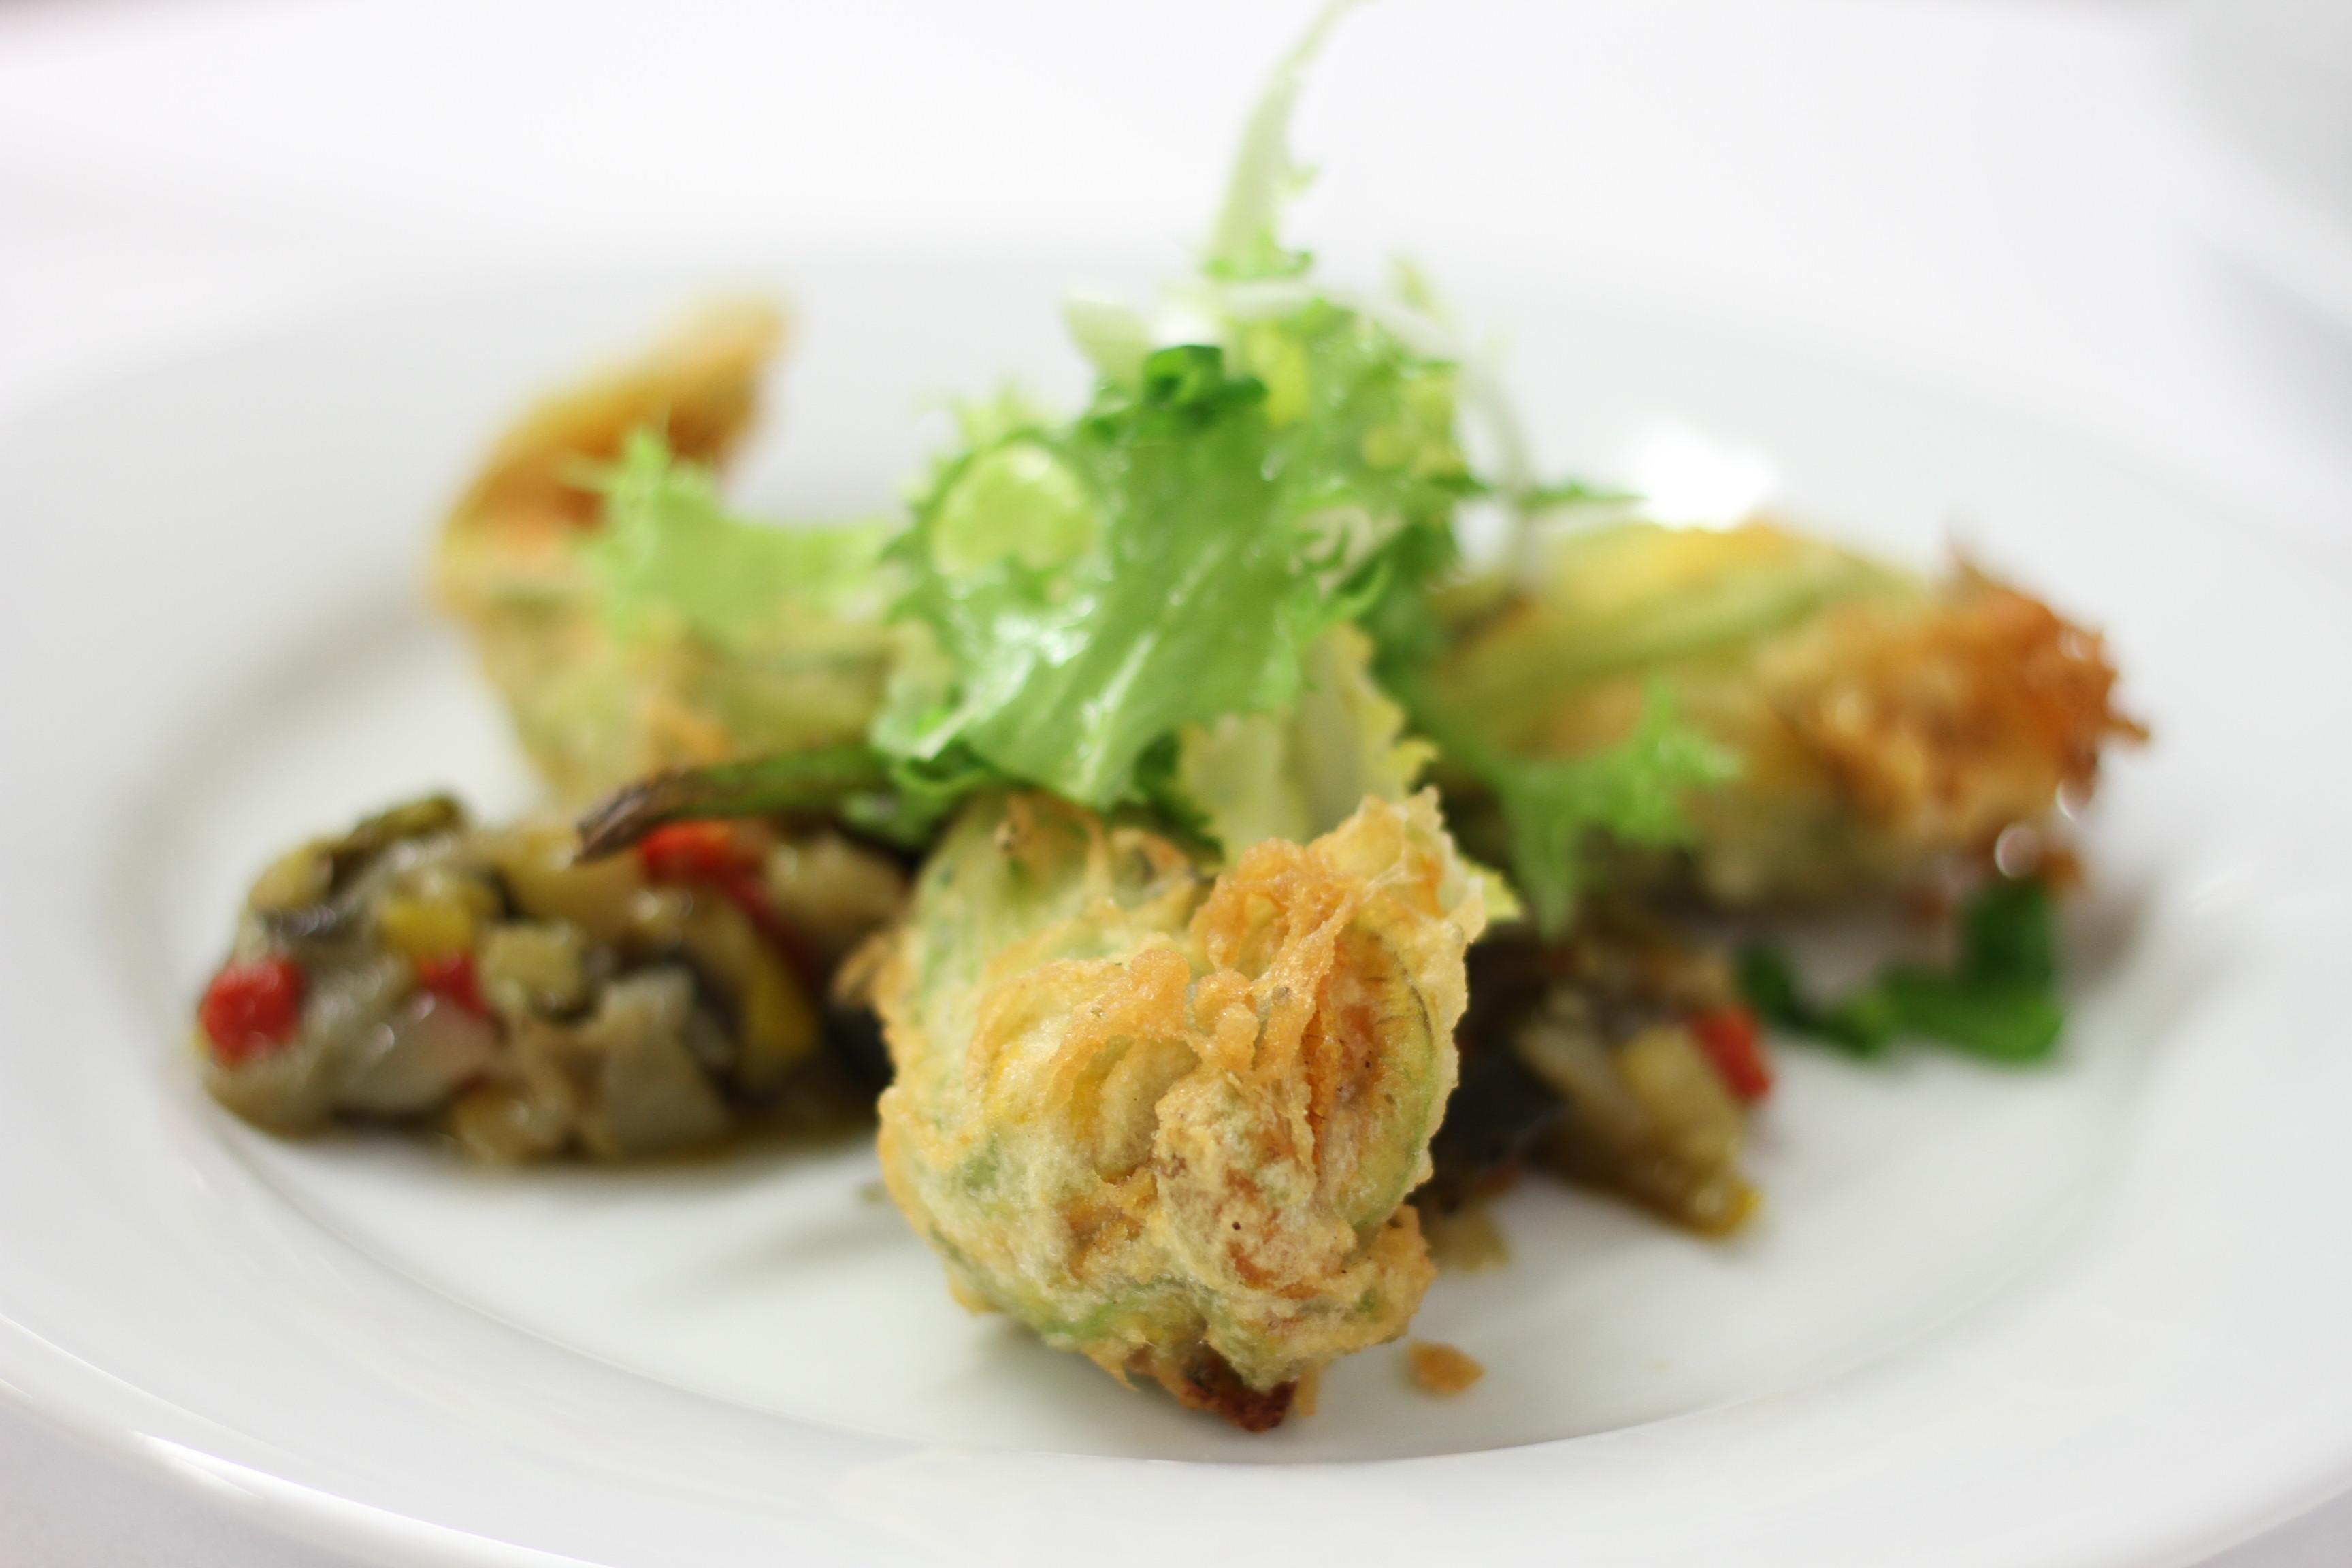 Draguignan la brasserie bertin de benjamin collombat - Beignets de fleurs de courgettes ...